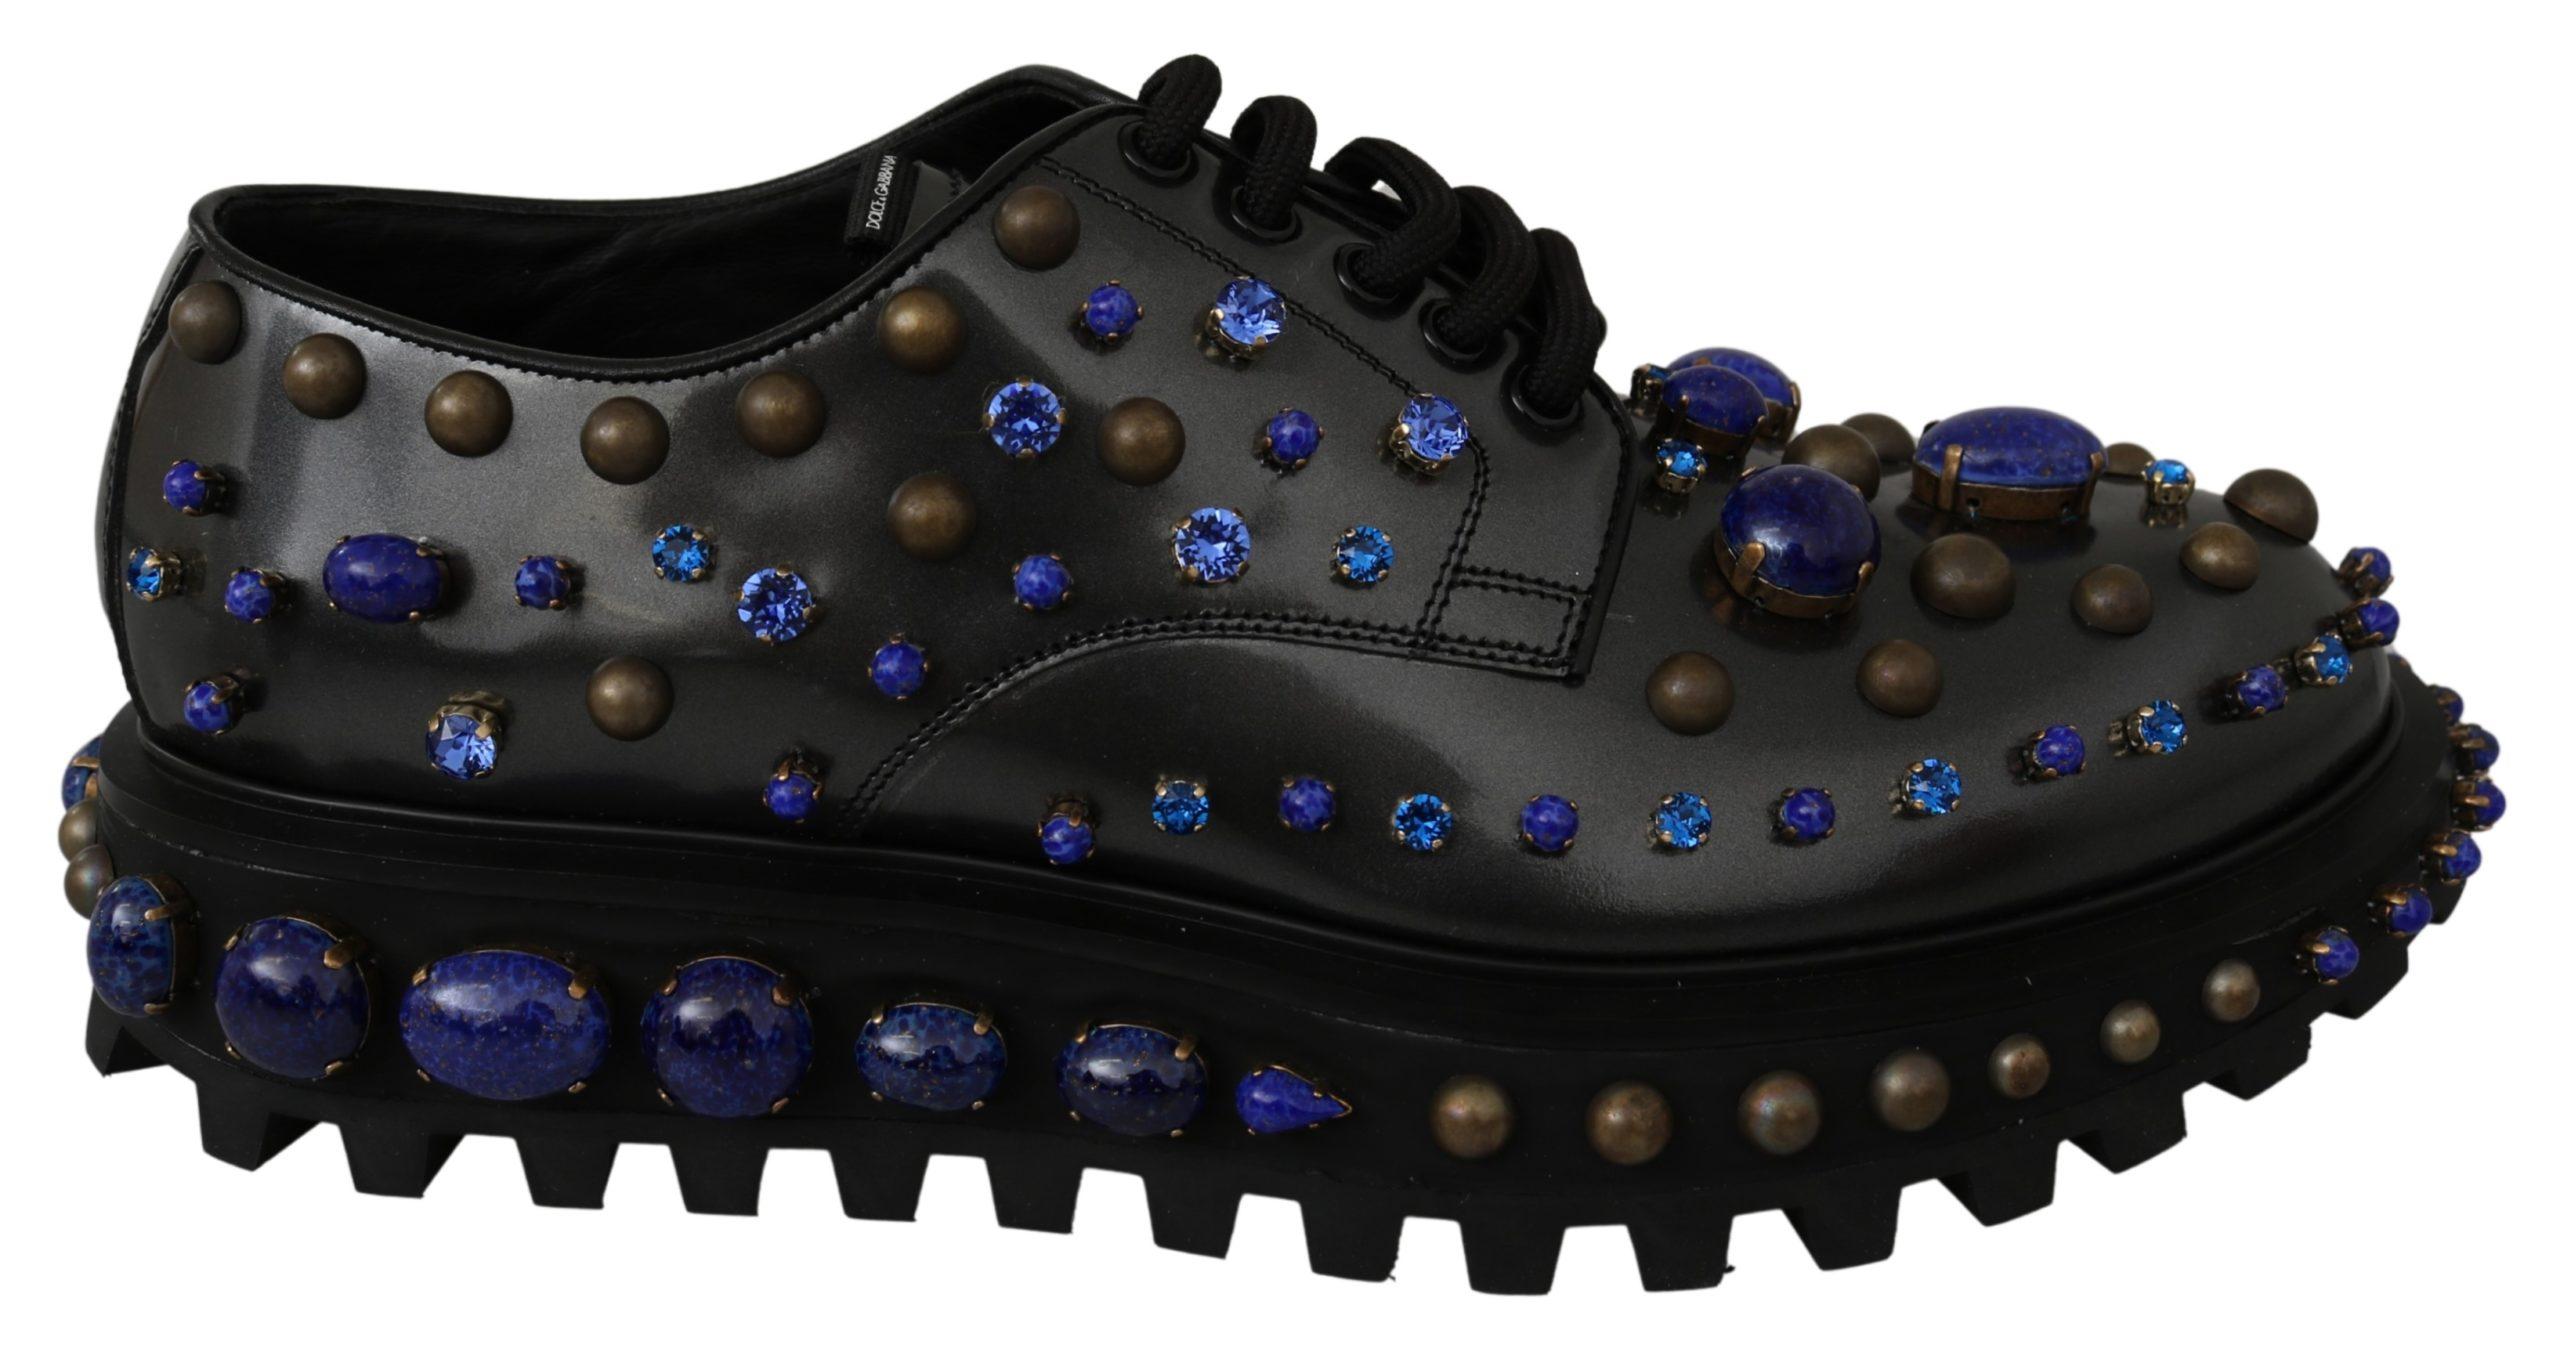 Dolce & Gabbana Men's Leather Fashion Crystal Derby Shoe Black MV3000 - EU44/US11